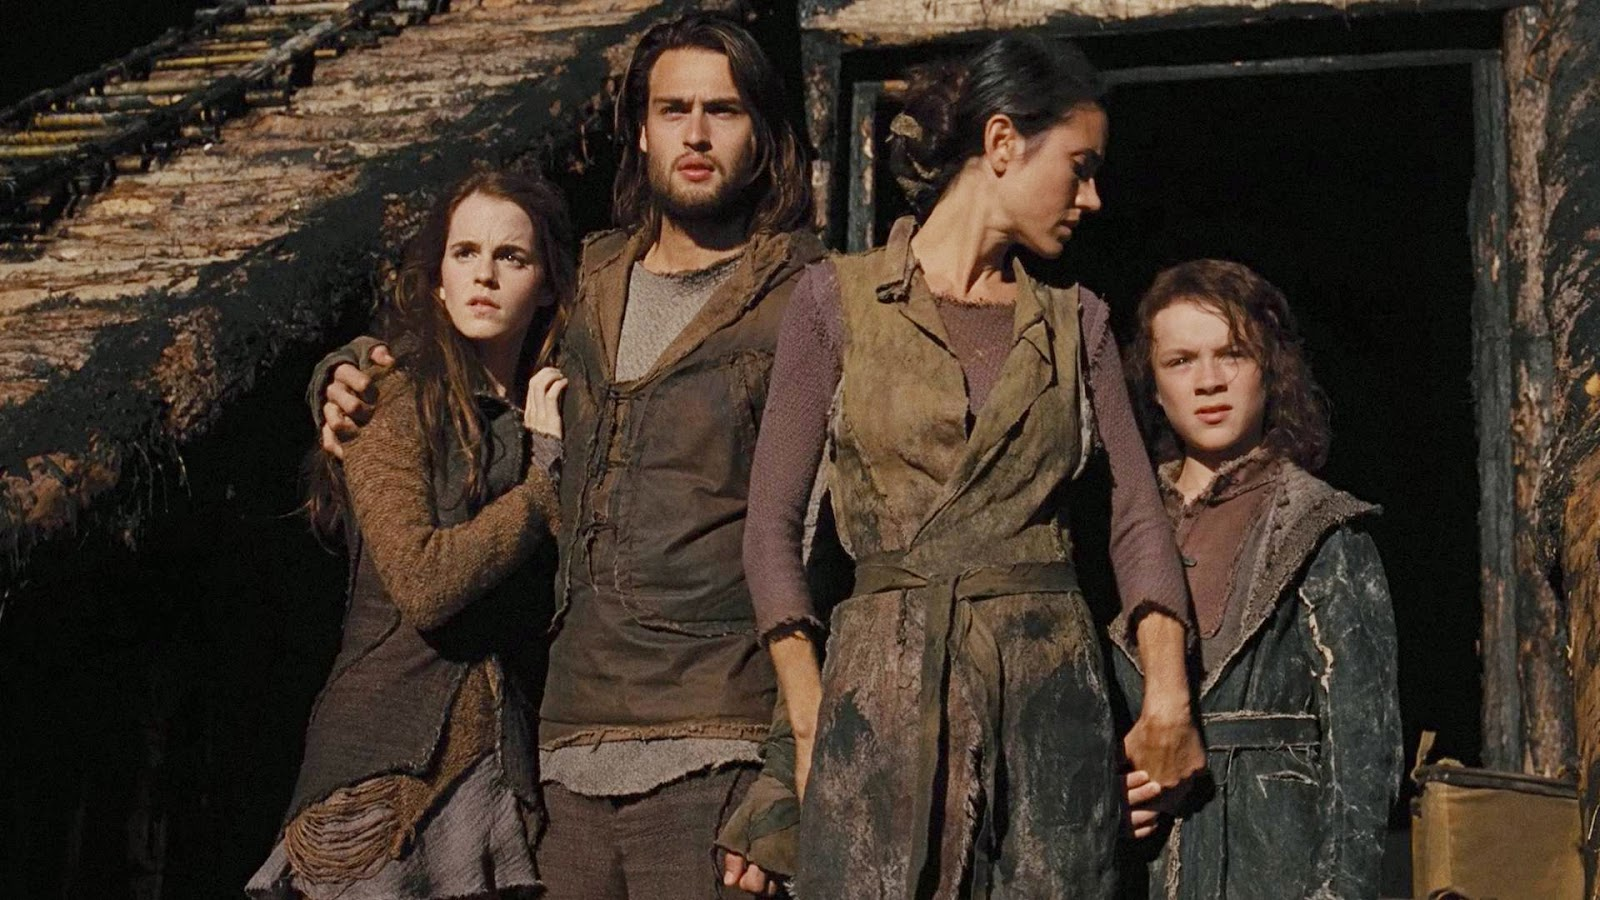 Noah (2014) - Opinion as a movie-freak